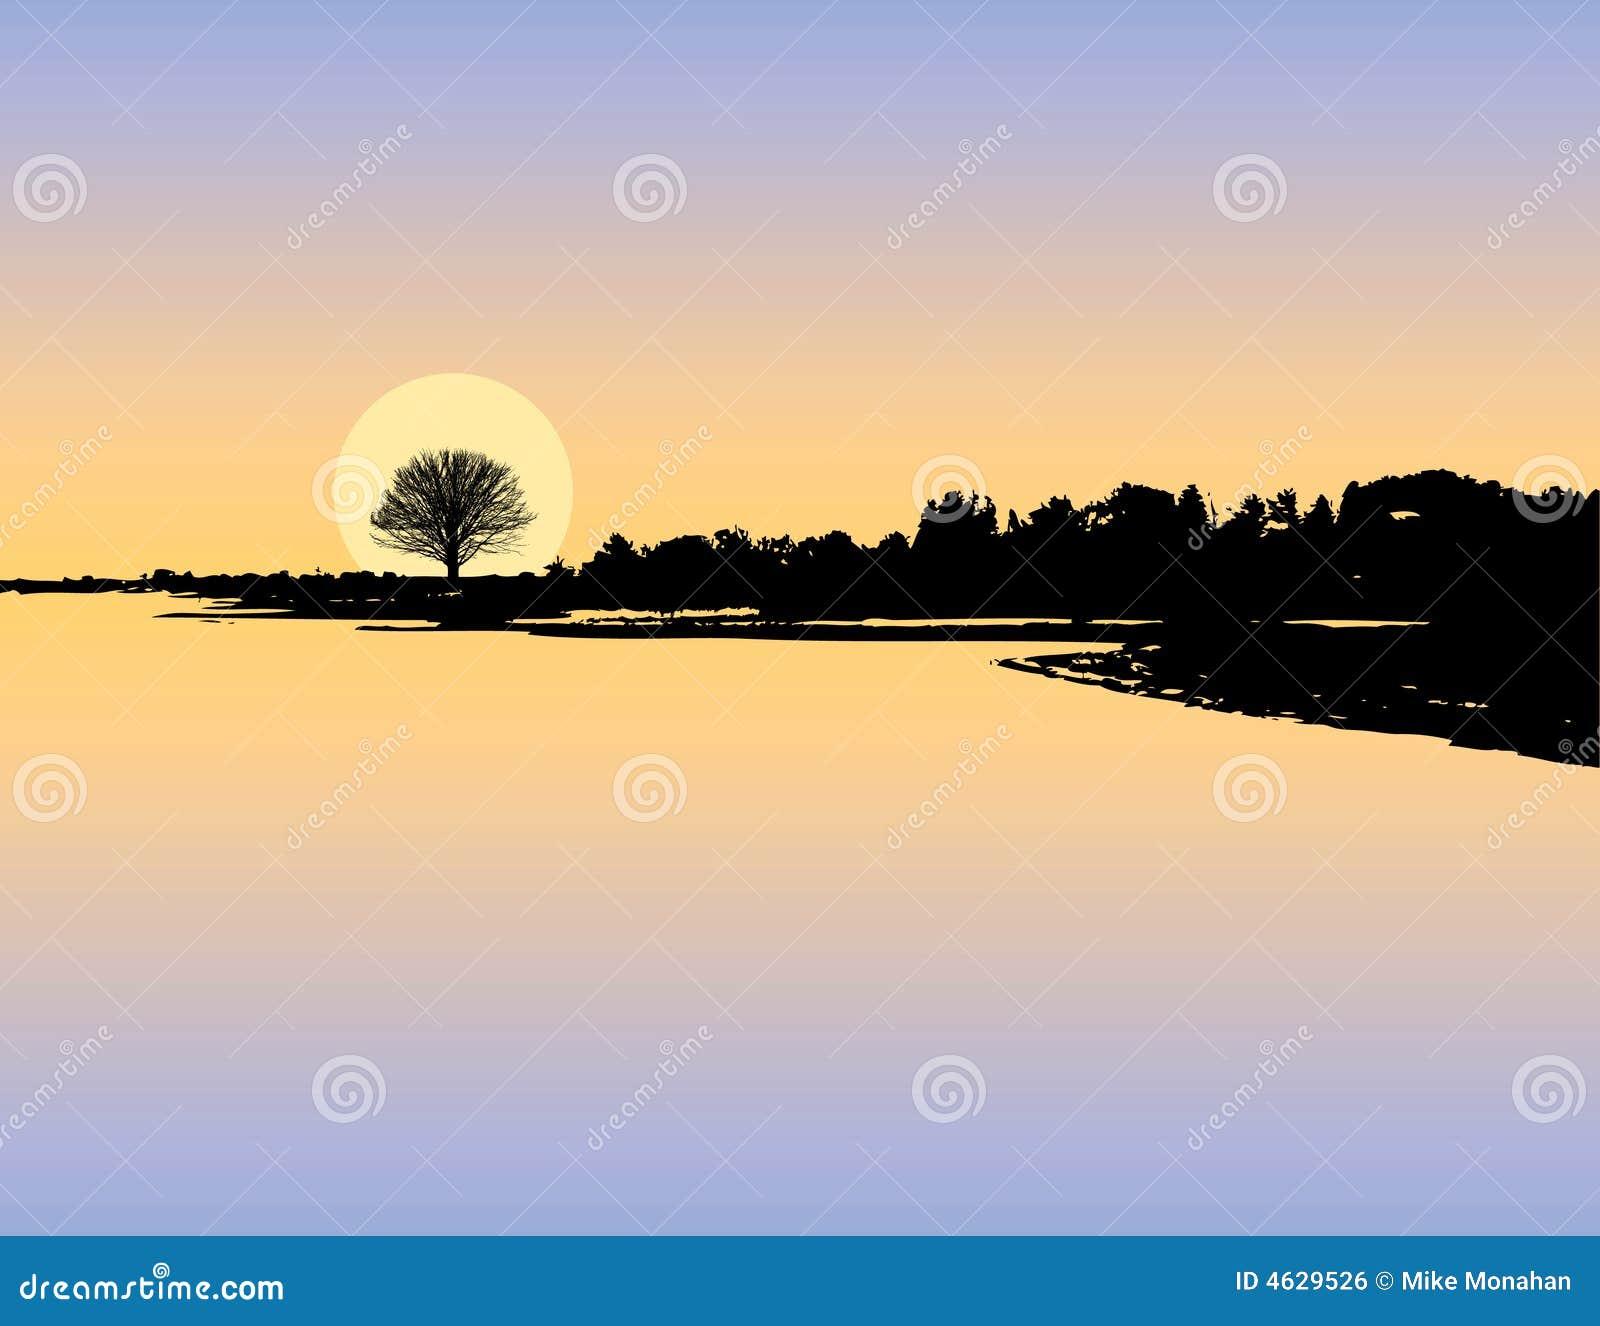 Sunset Lake Silhouette Royalty Free Stock Image - Image ...